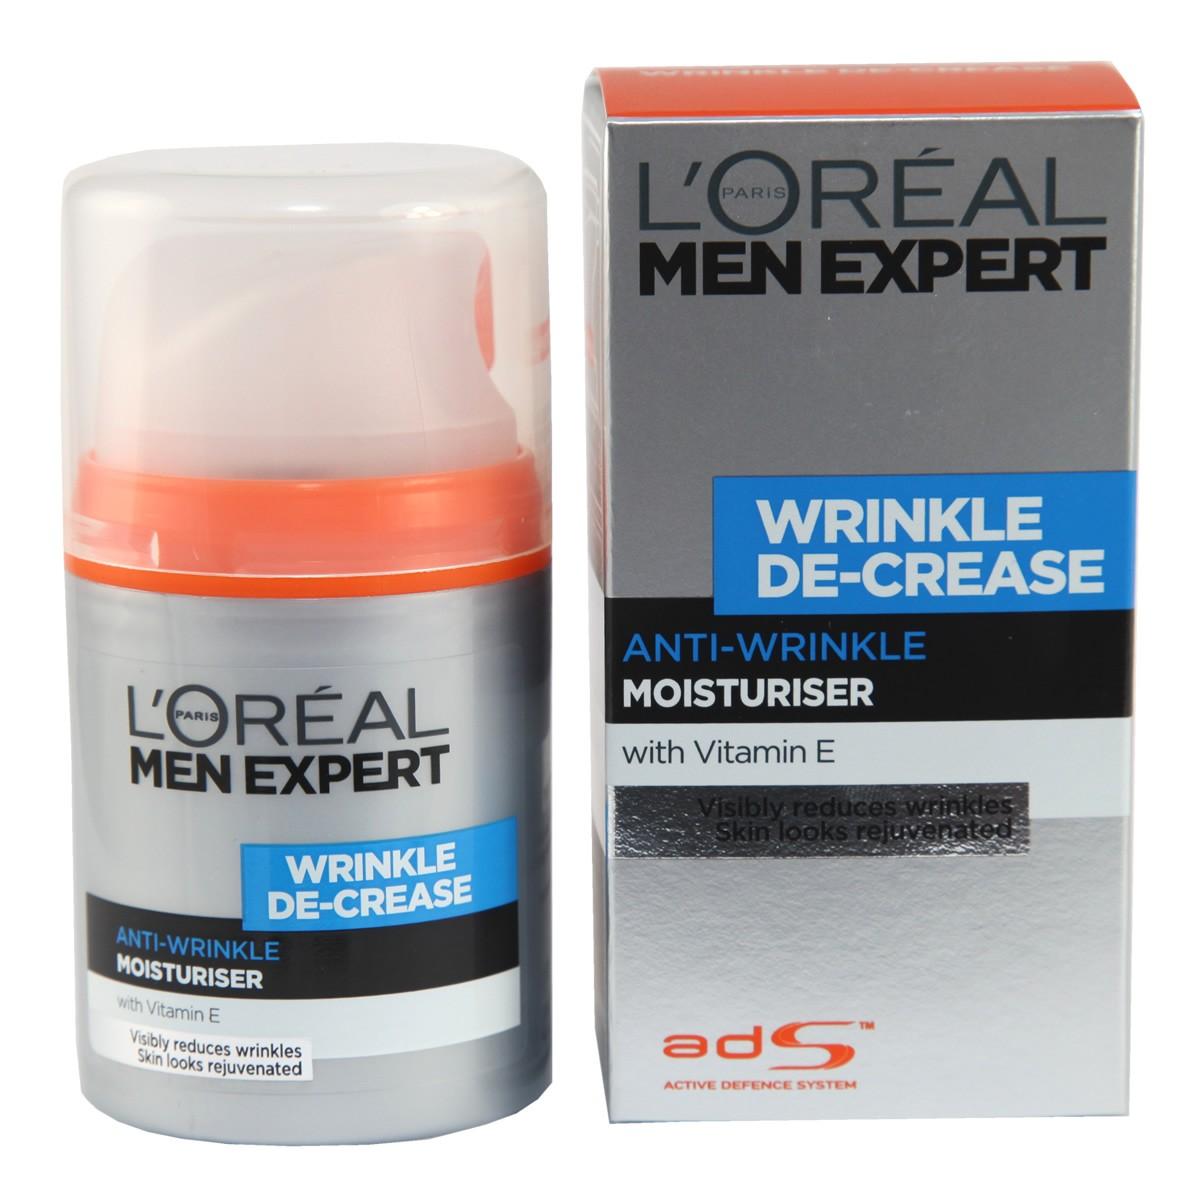 L'Oreal Paris Men Expert Wrinkle De-Crease Moisturiser